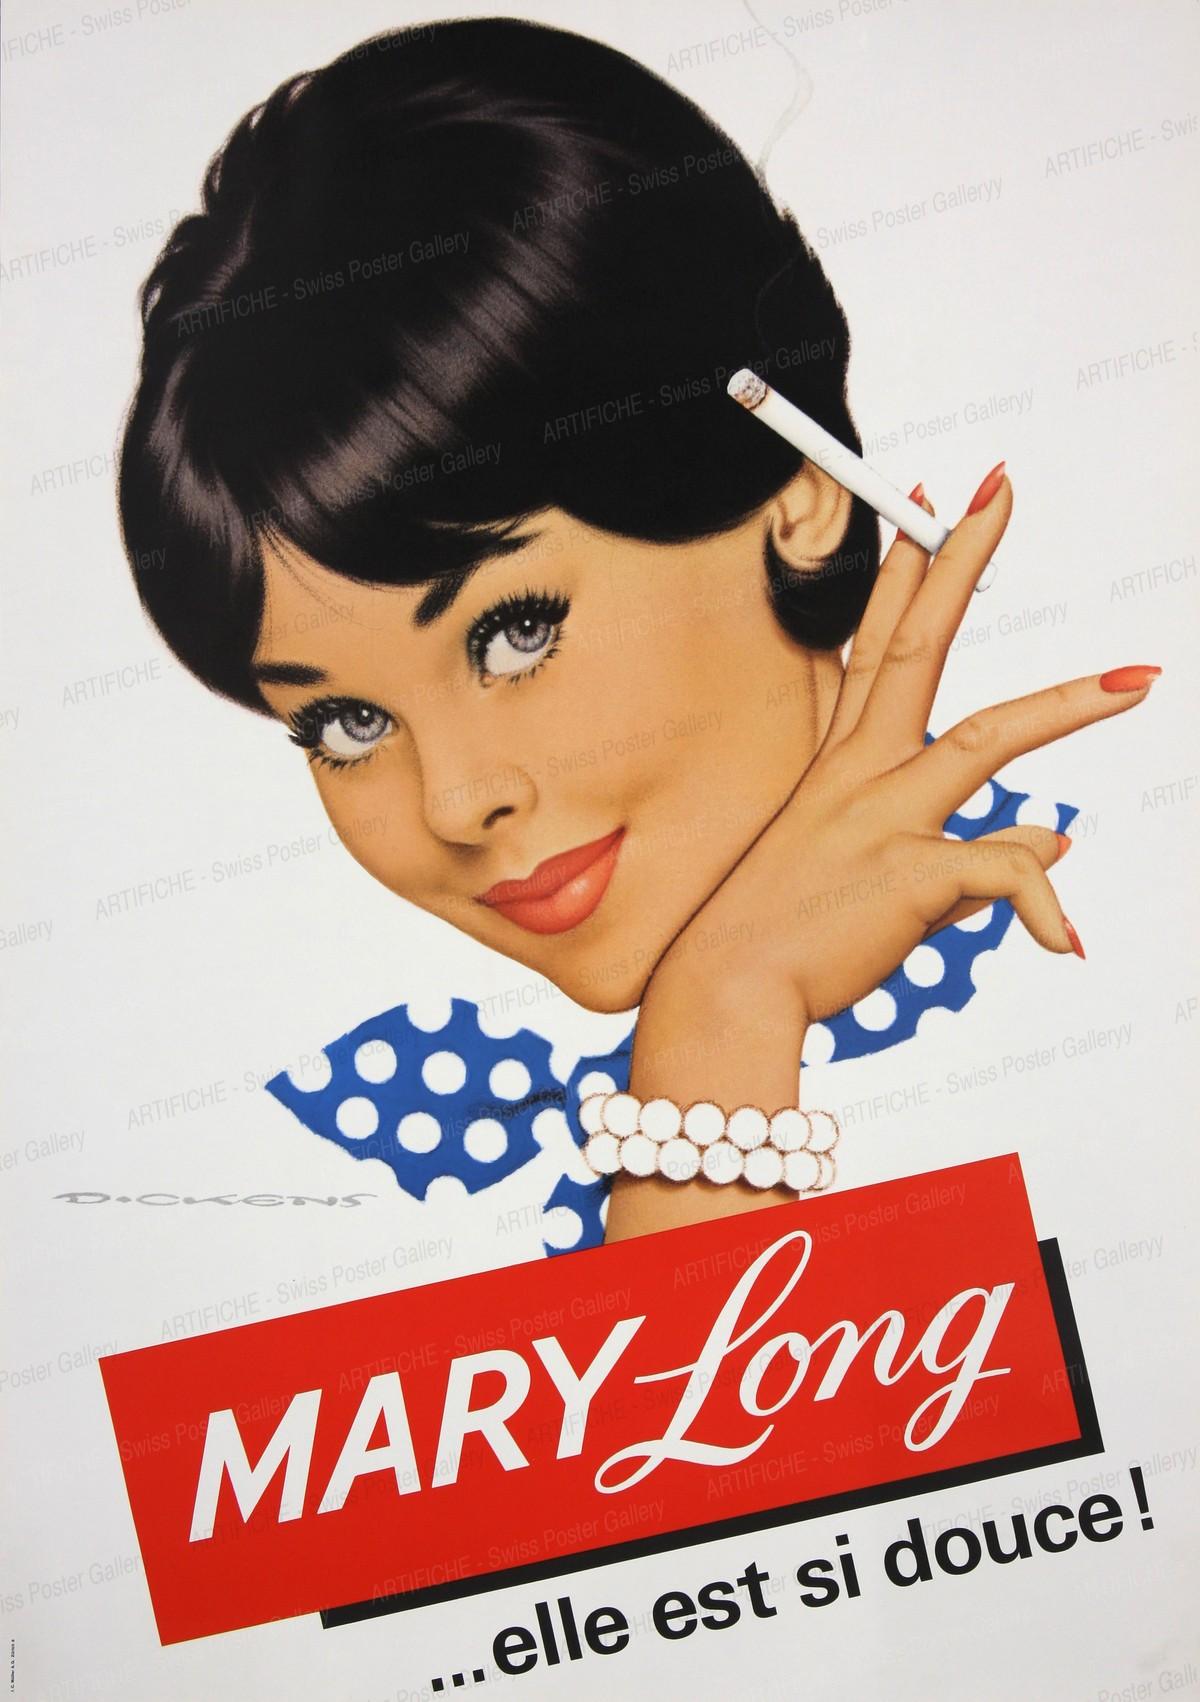 MARY Long – elle est si douce!, Archie Dickens